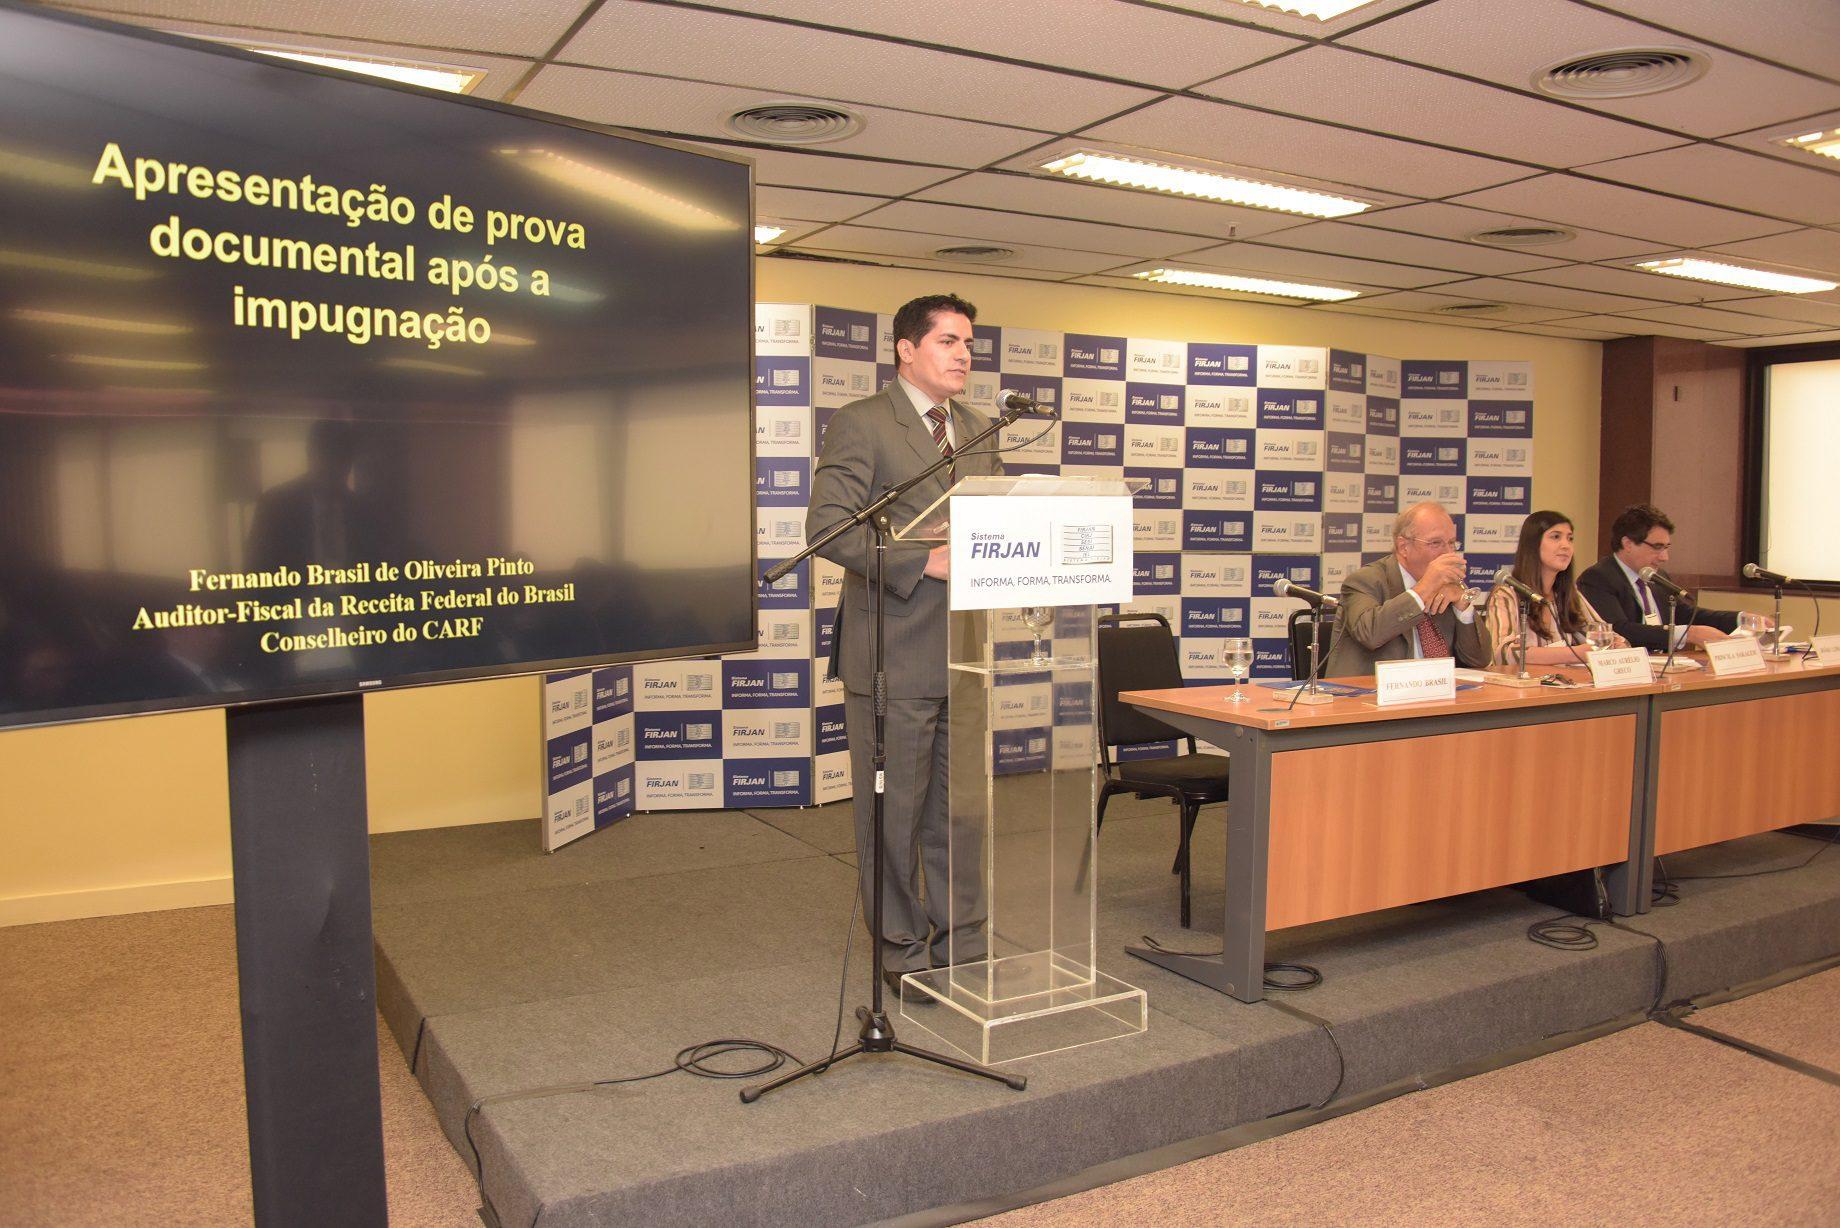 Fernando Brasil de Oliveira Pinto